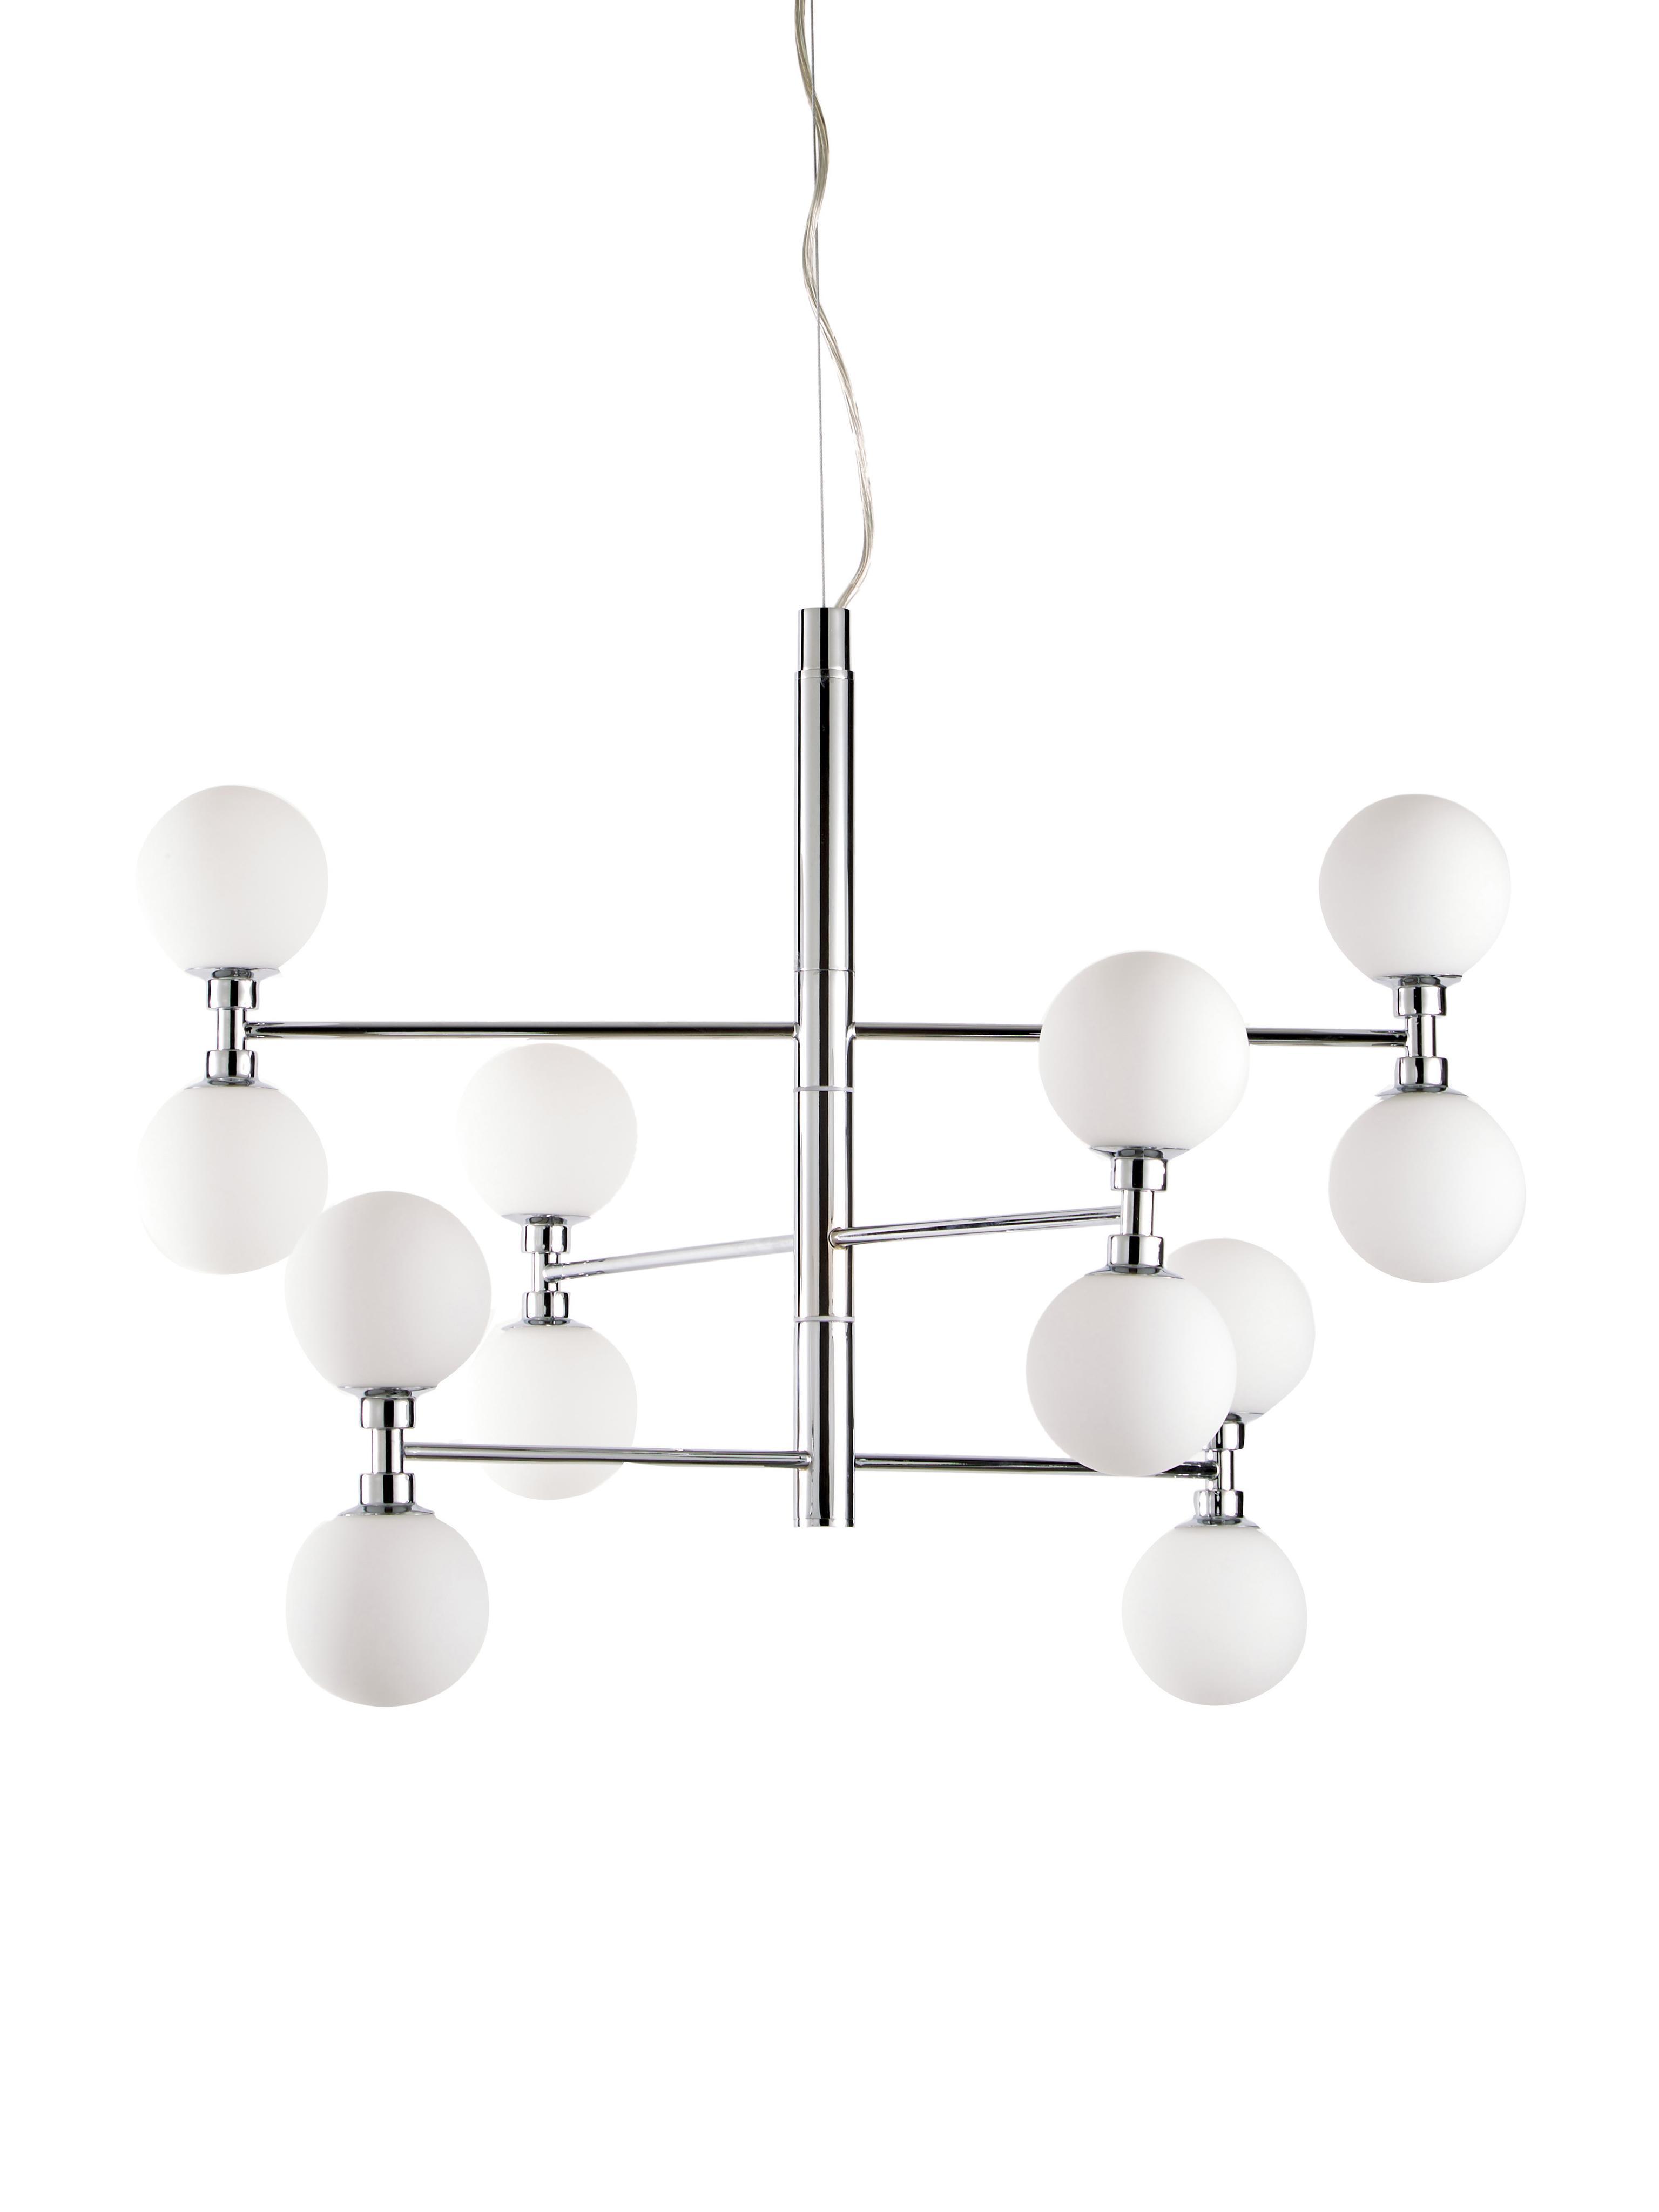 Glaskugel-Pendelleuchte Grover, Baldachin: Metall, verchromt, Chrom, Ø 70 x H 56 cm